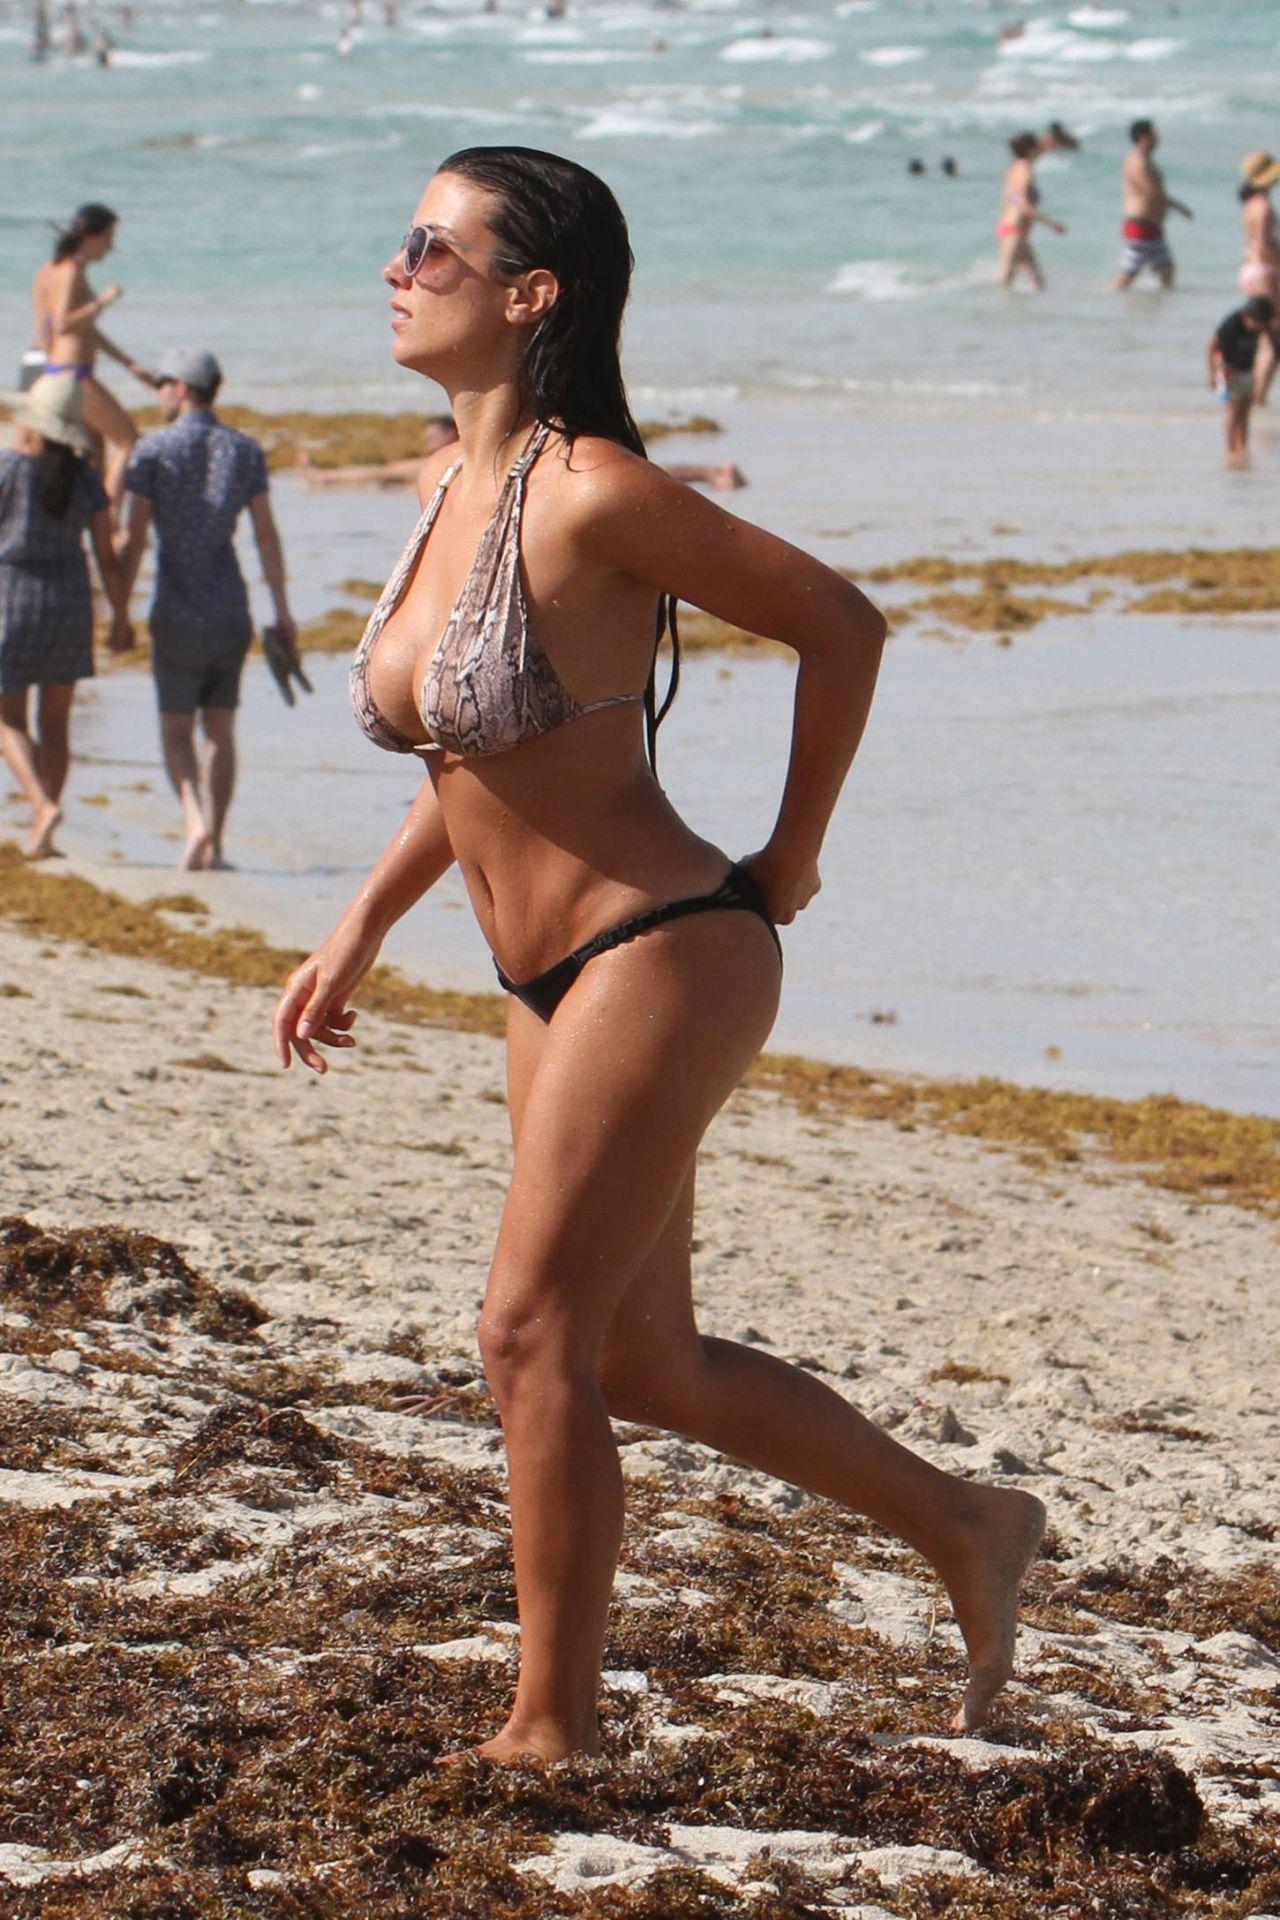 Ludivine sagna miami beach - 1 6